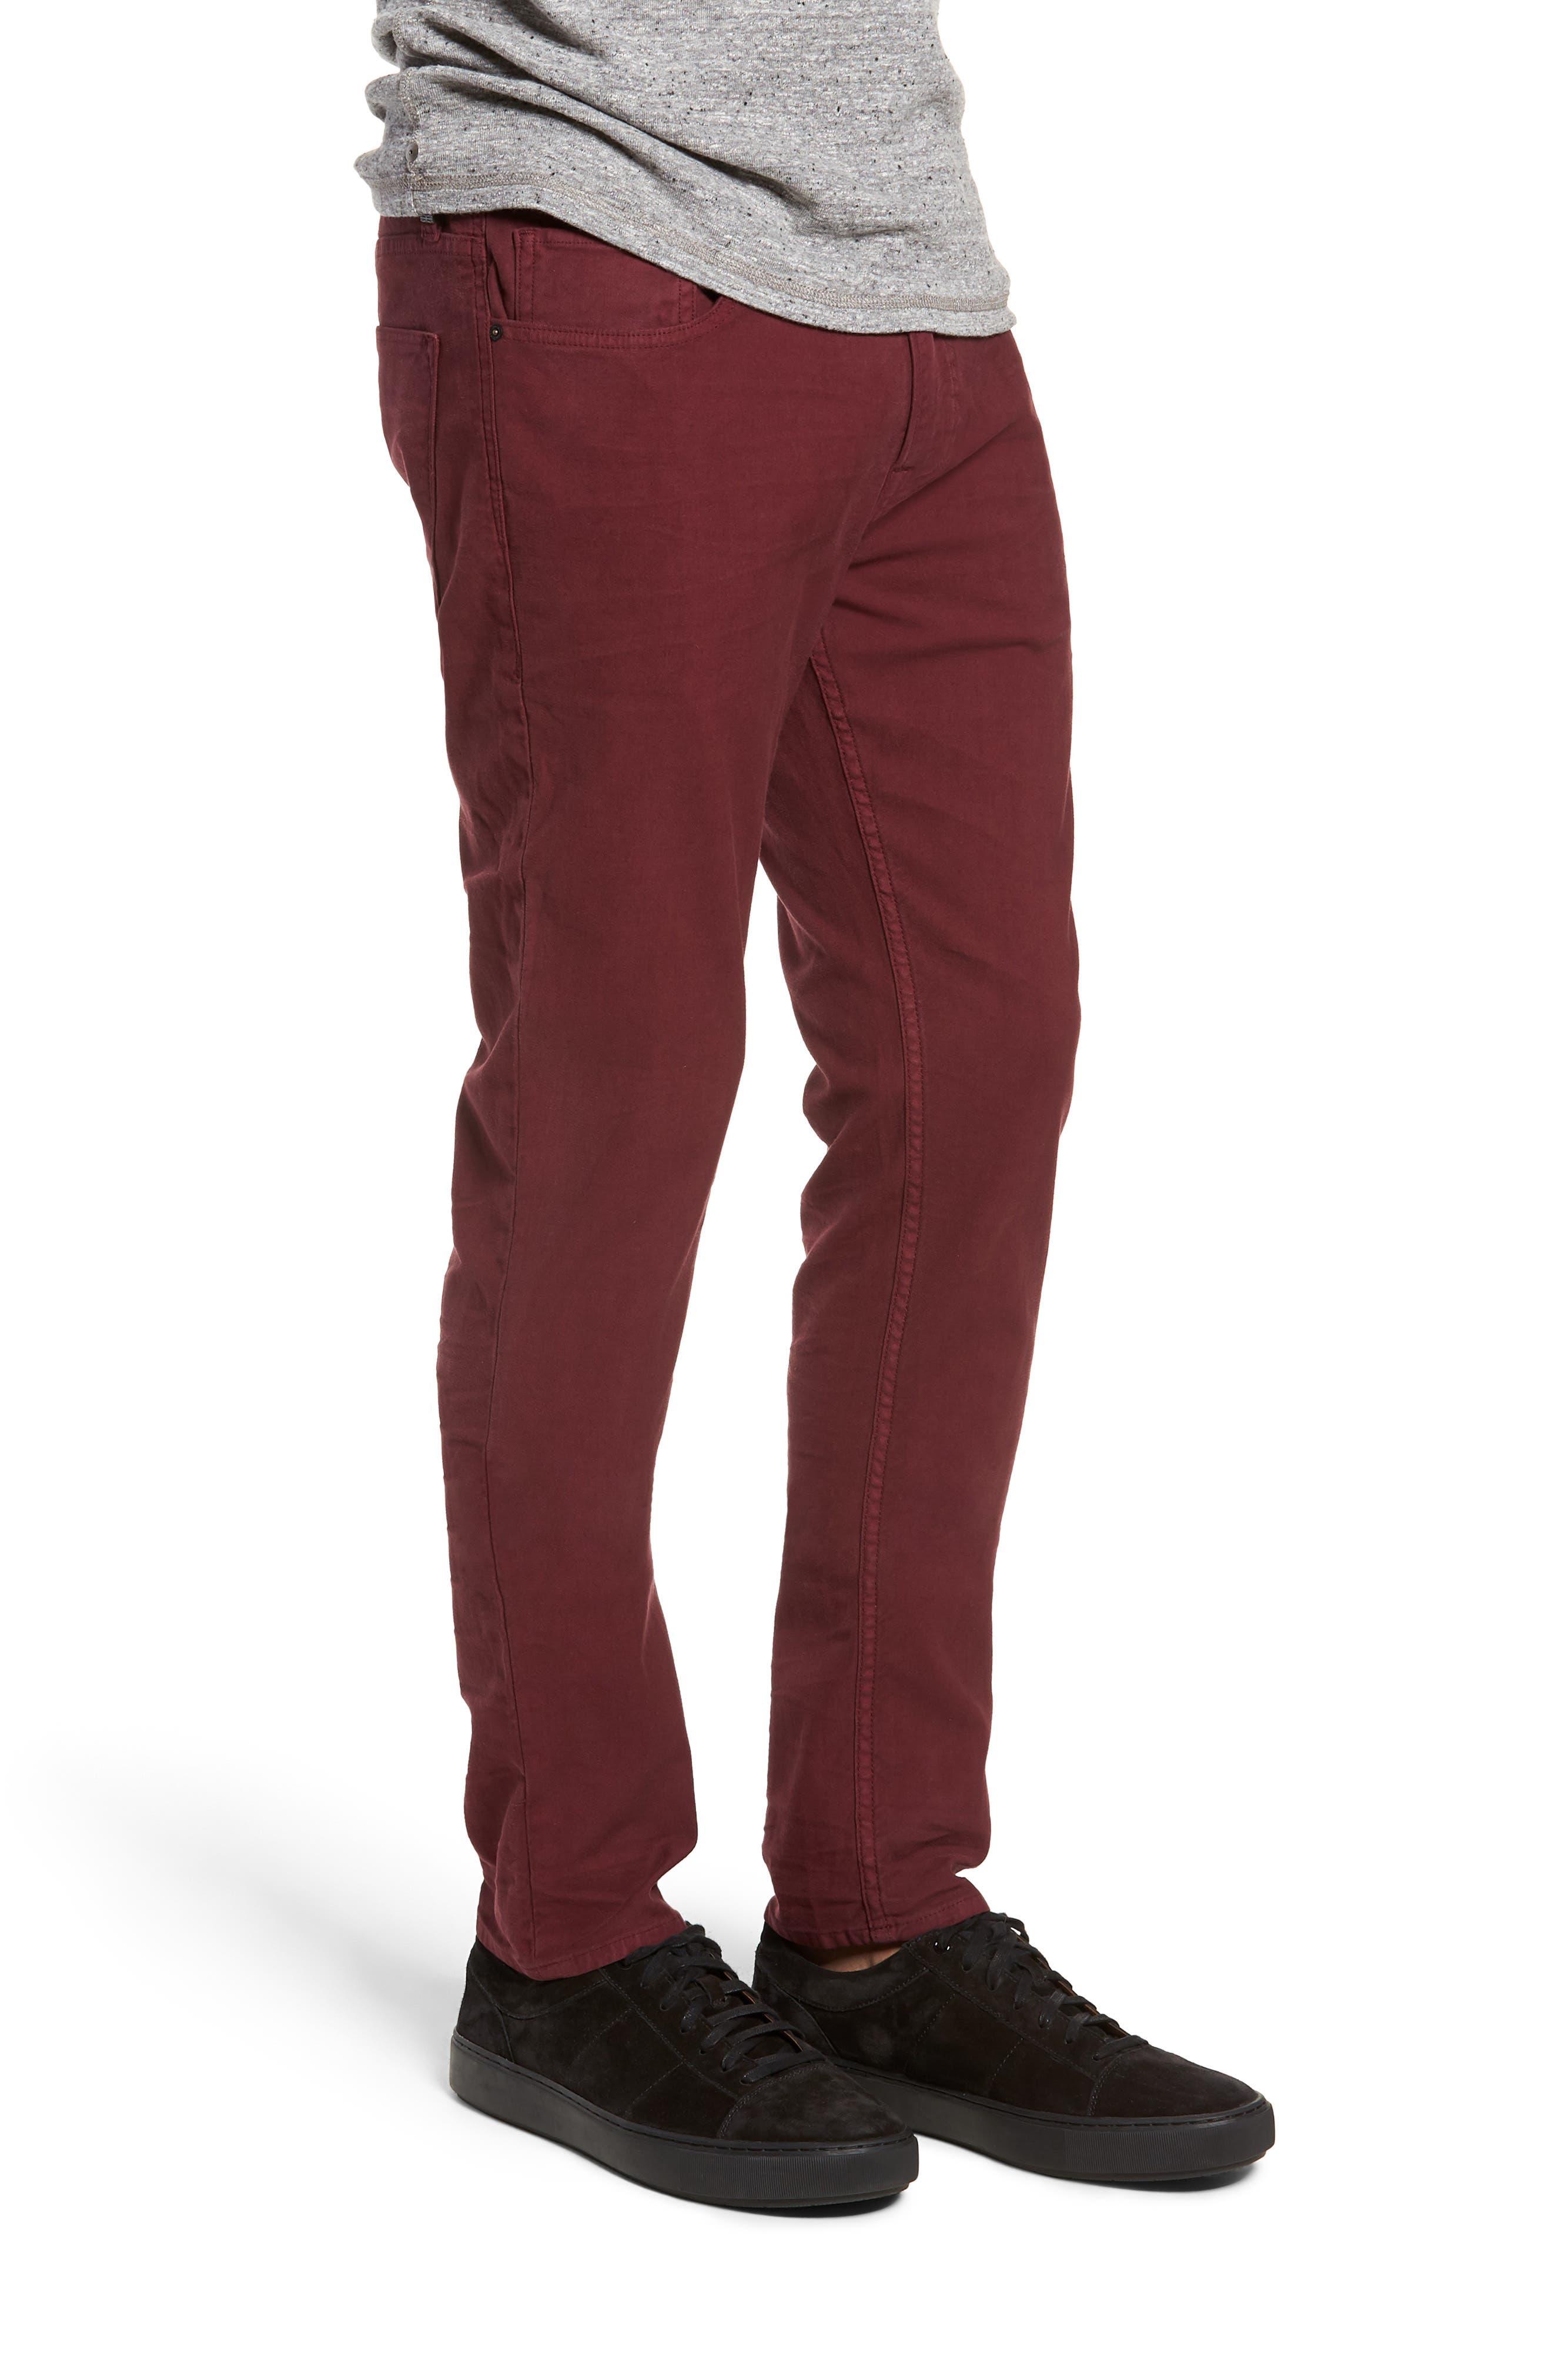 Axl Skinny Fit Twill Jeans,                             Alternate thumbnail 3, color,                             OXBLOOD